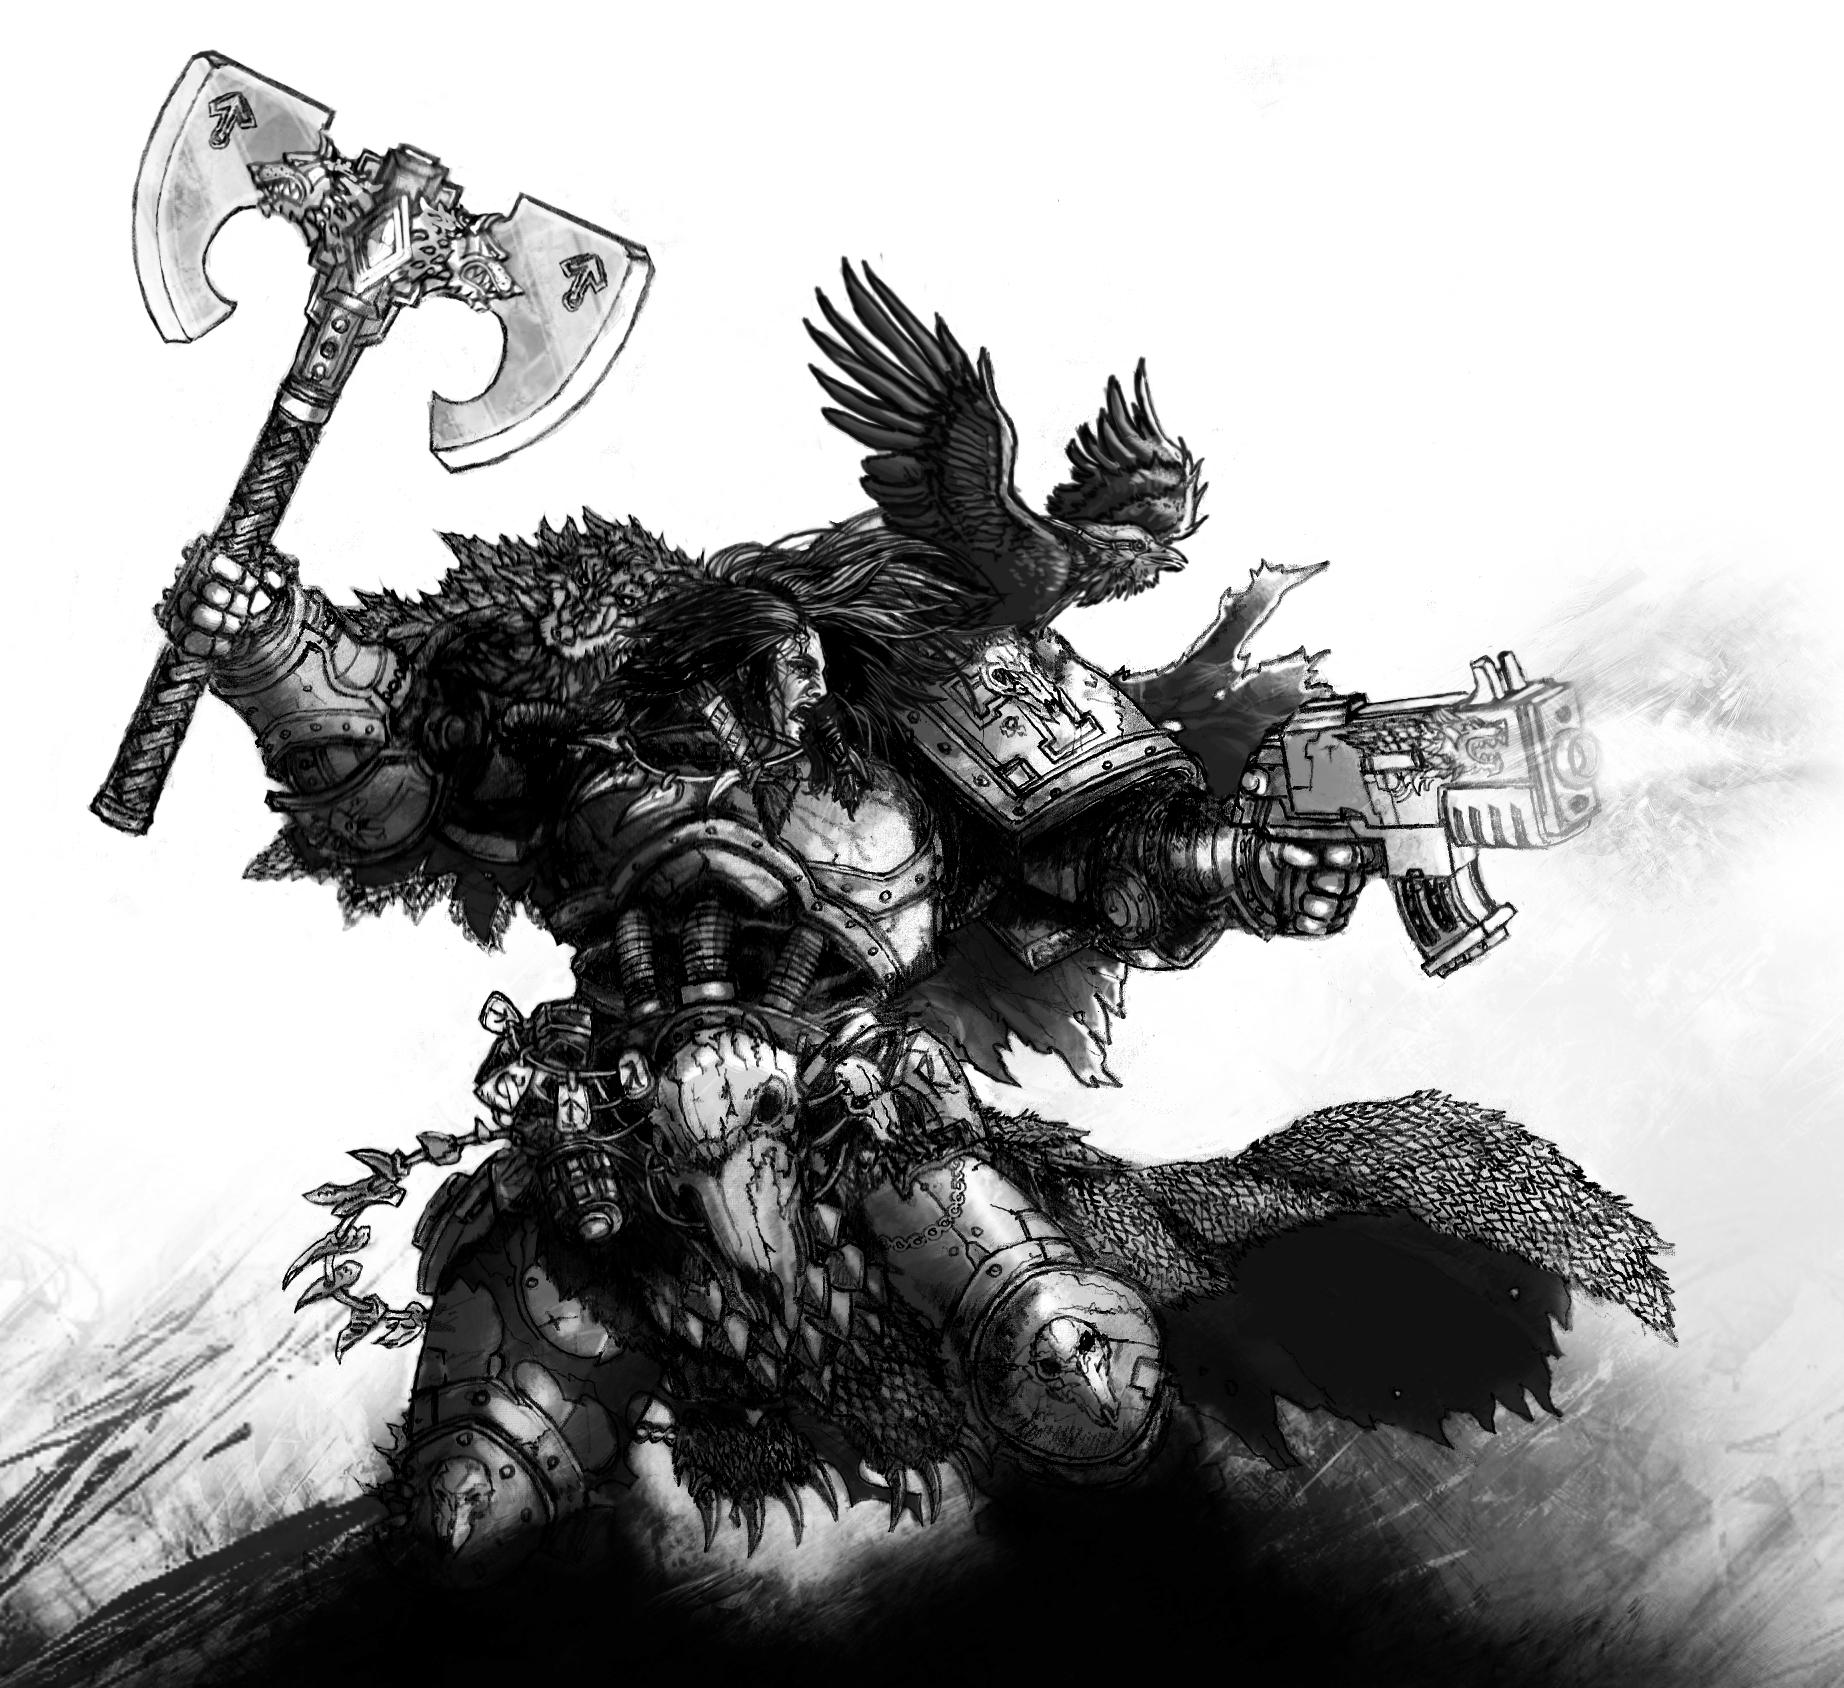 warhammer_space_wolf_by_django_red-d3rghhu.jpg